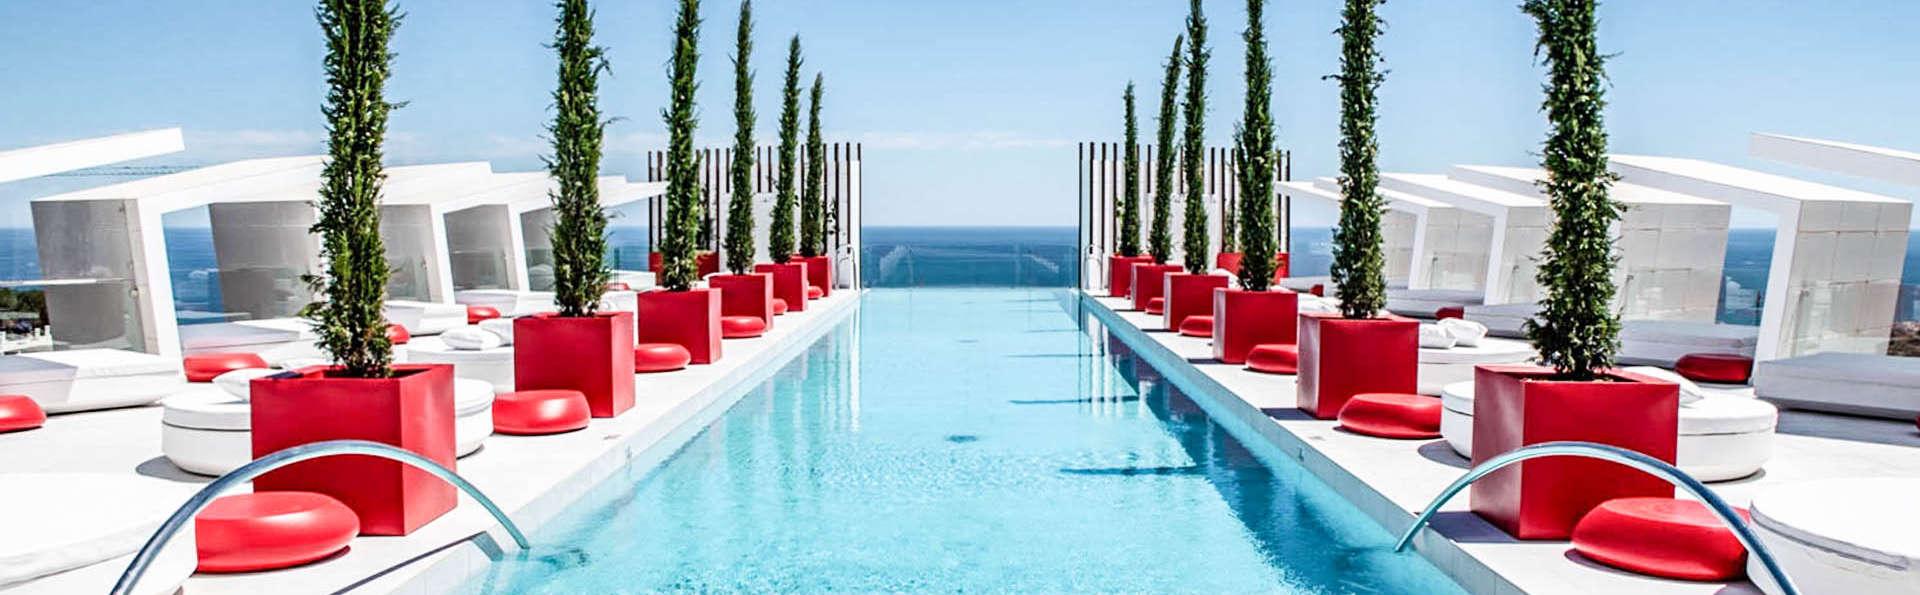 Higuerón hotel Málaga, Curio Collection by HILTON  - EDIT_PRINCIPAL_-_Infinity_01.jpg